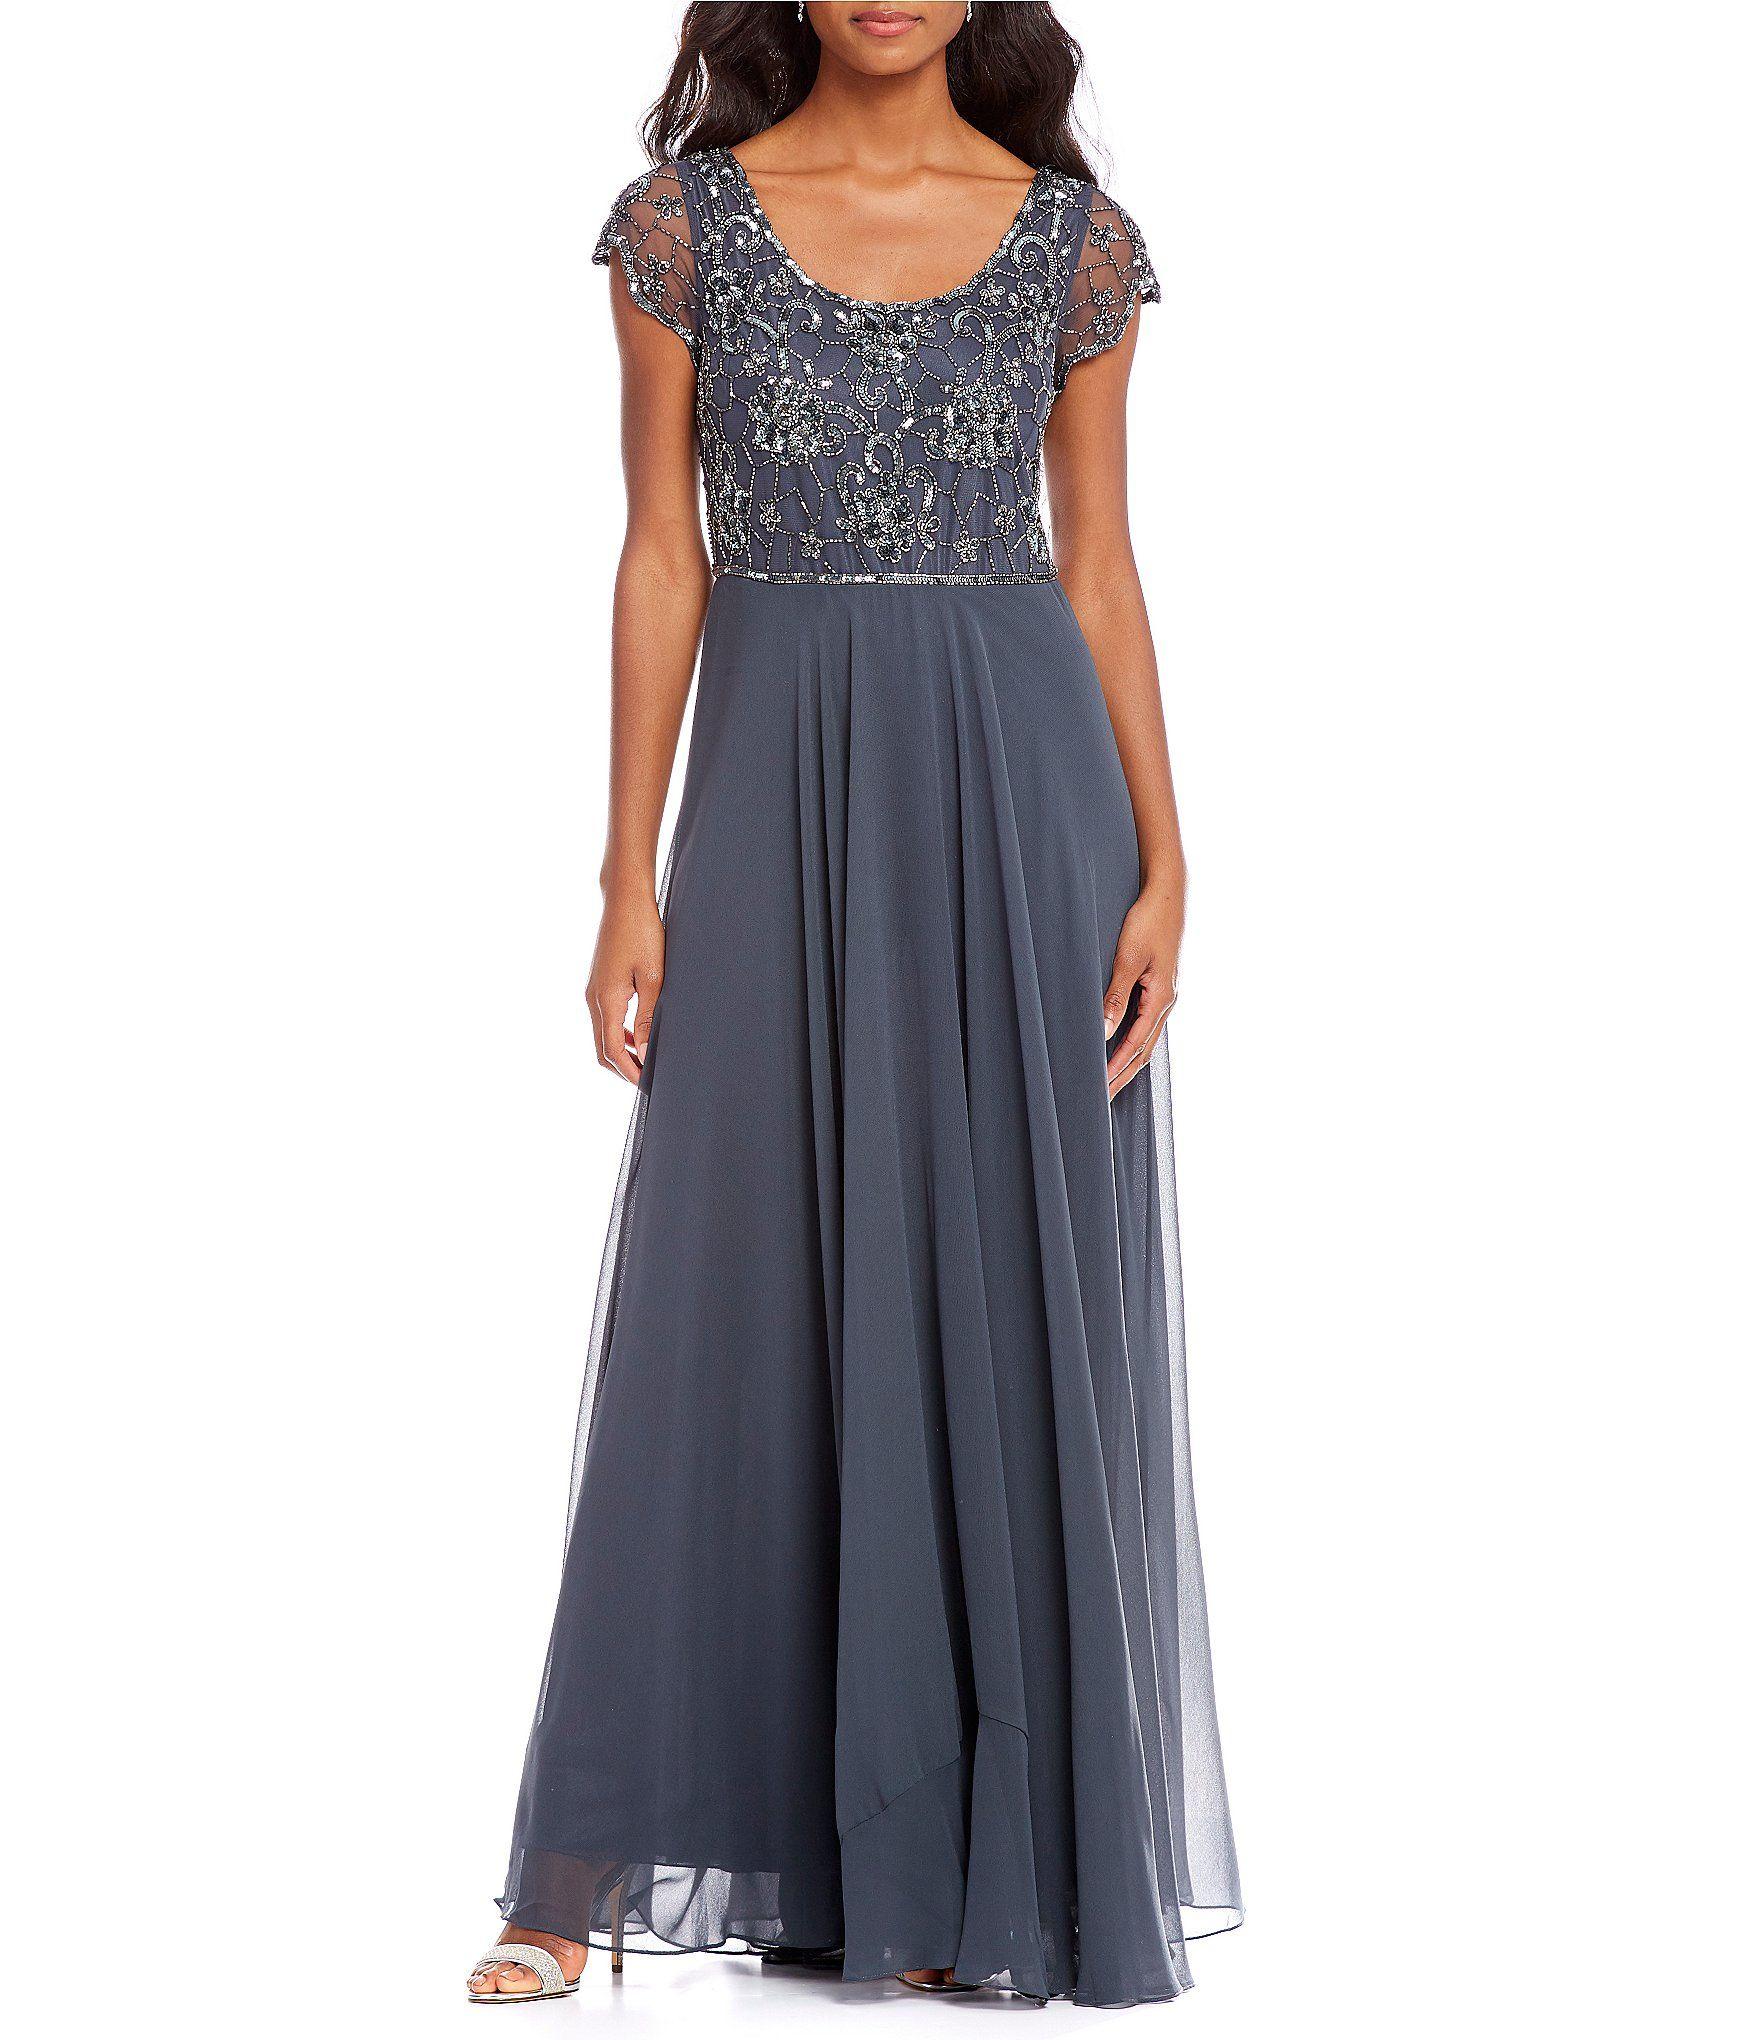 Jkara Floral Beaded Scoop Neck Gown | Pinterest | Vestiditos